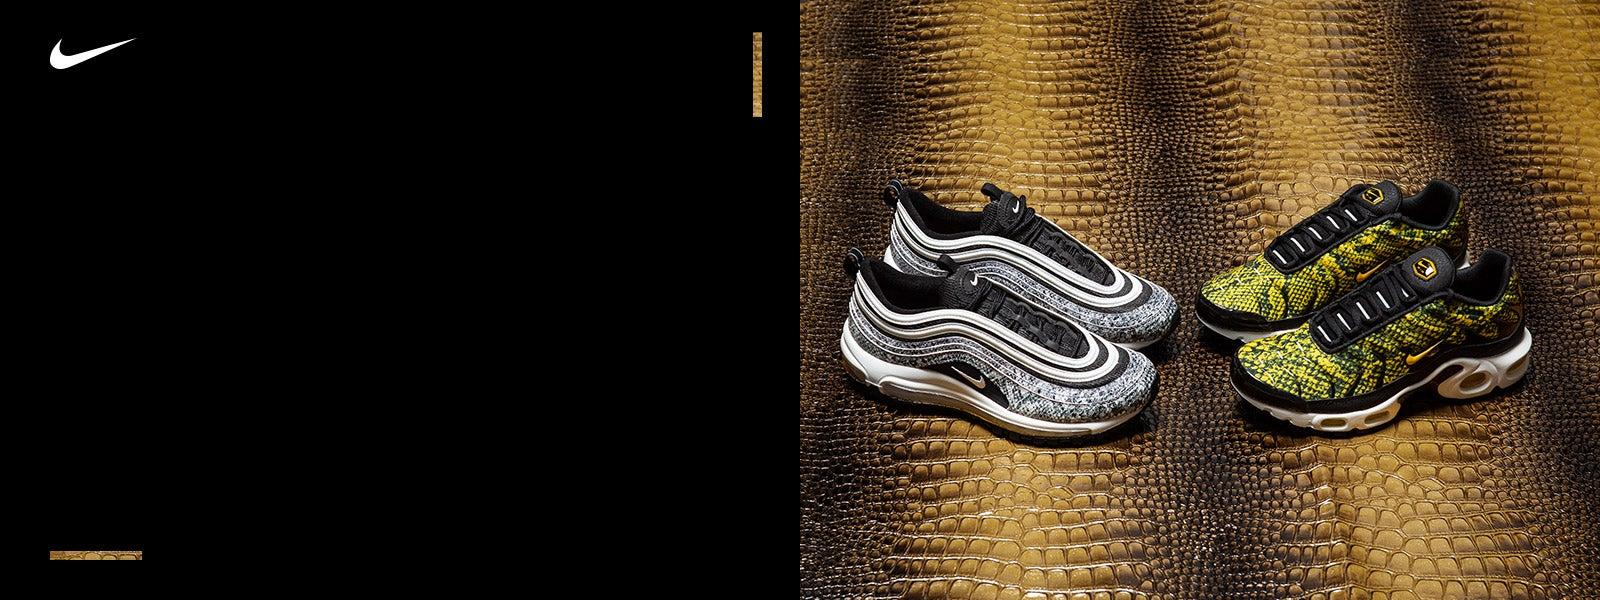 Shop the Women's Nike Python footwear & apparel.